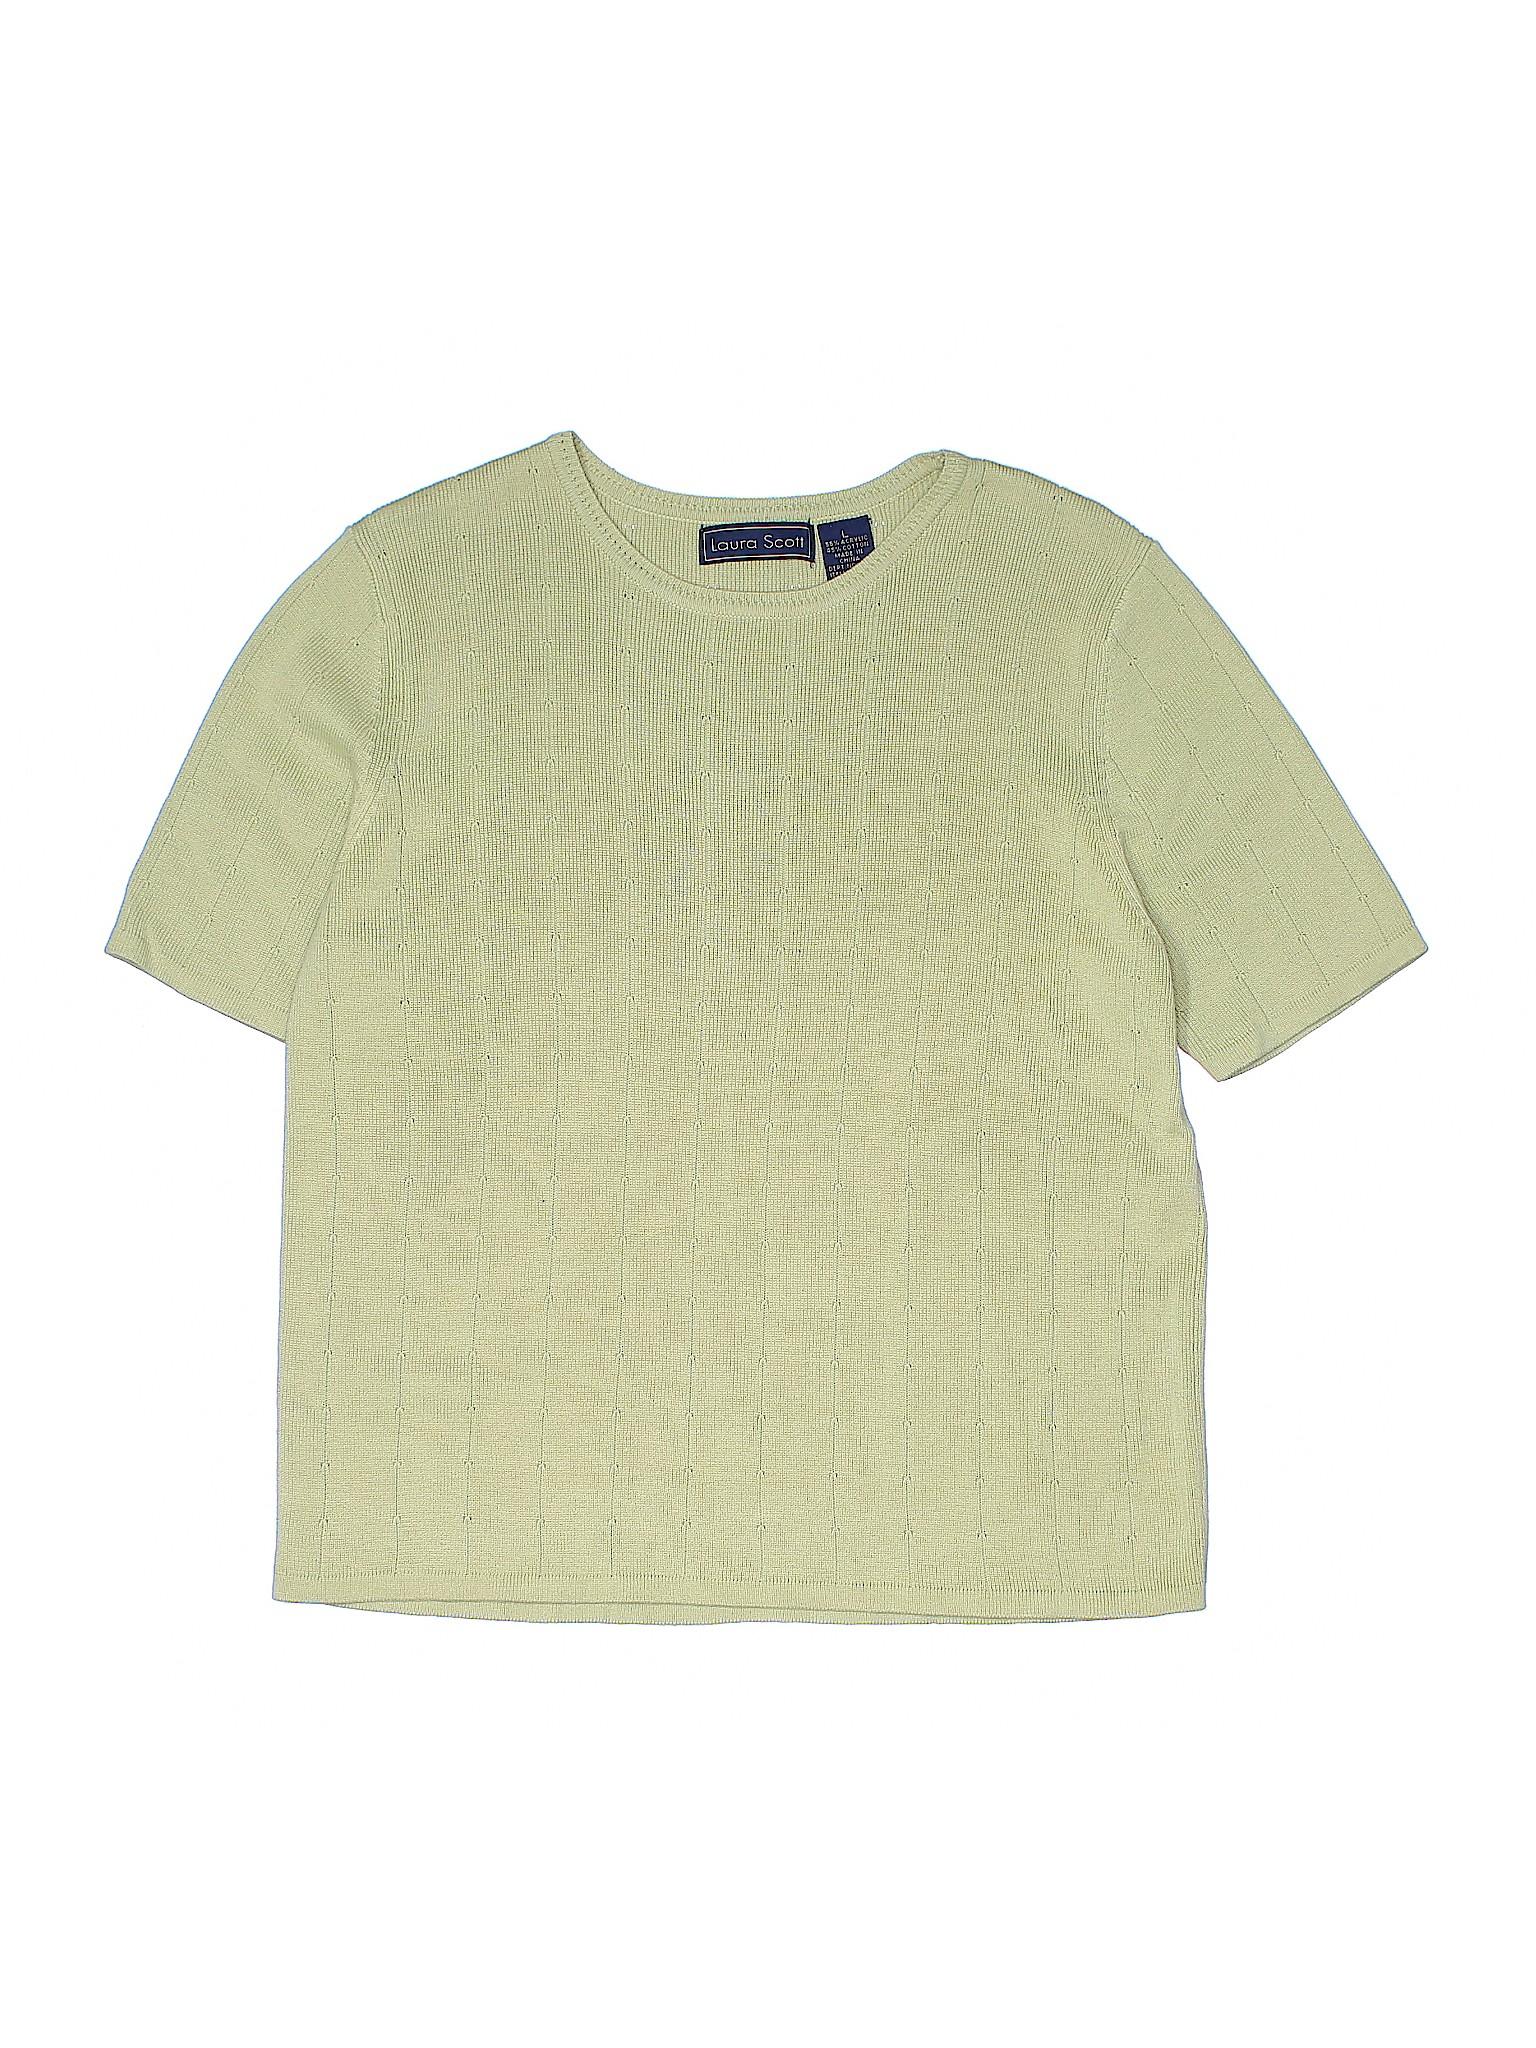 Laura Boutique Boutique Boutique Laura Pullover Pullover Scott Sweater Sweater Laura Scott Hqnw5Fg0